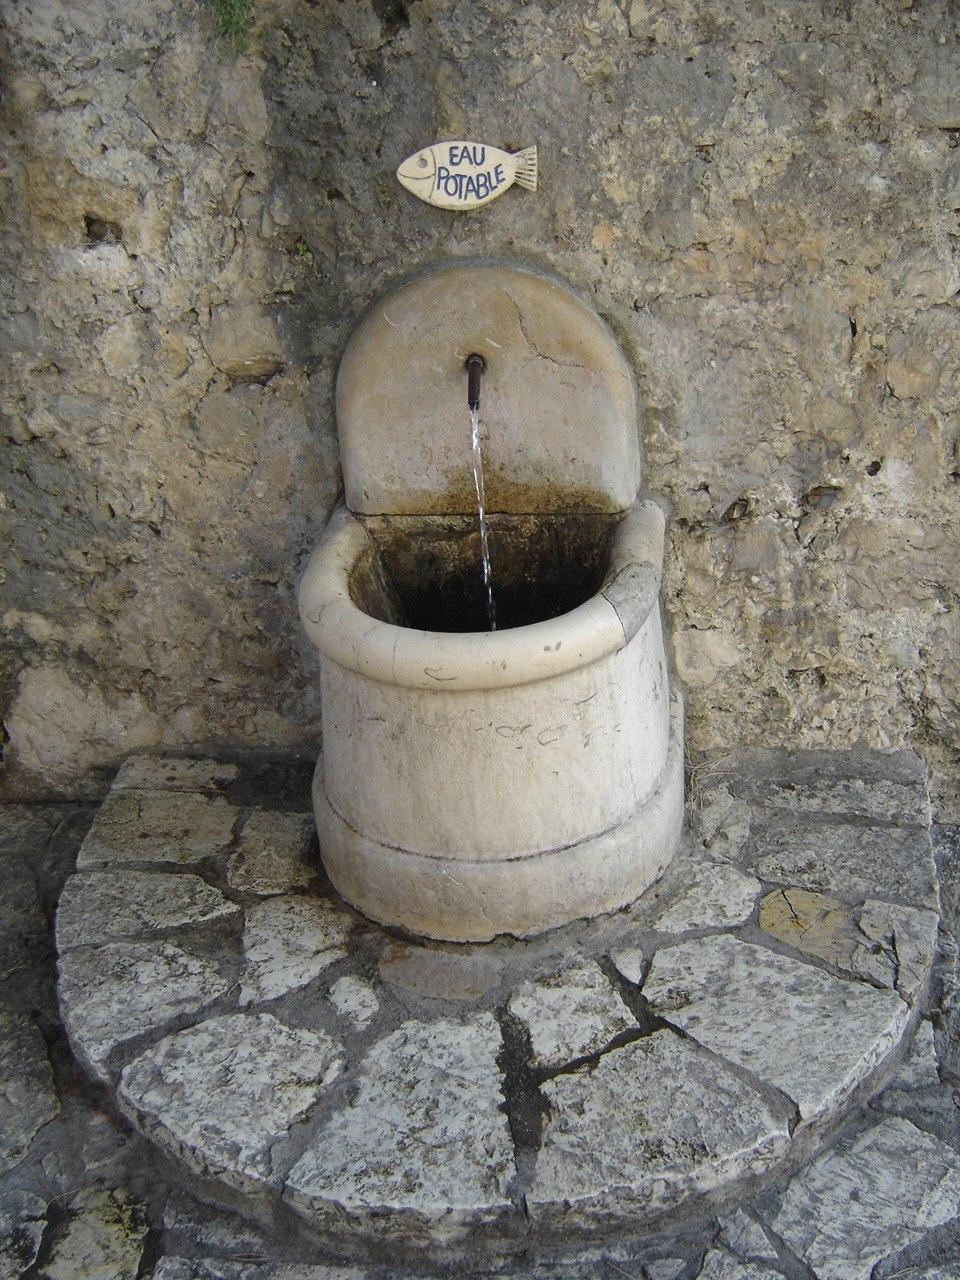 A drinking fountain in Saint-Paul-de-Vence